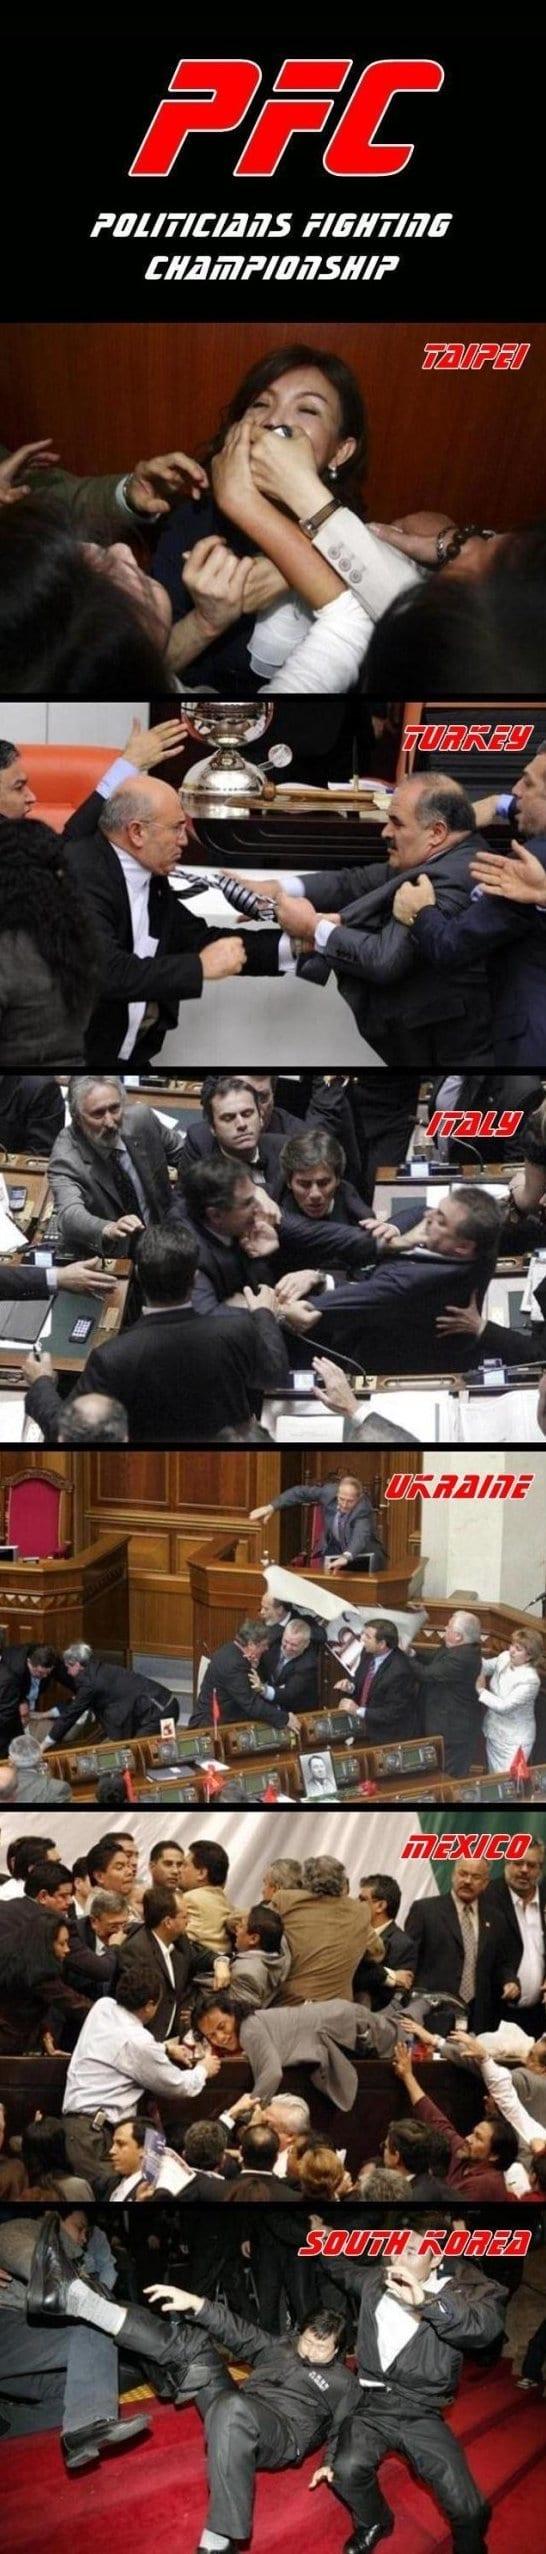 funny-politicians-debating-meme